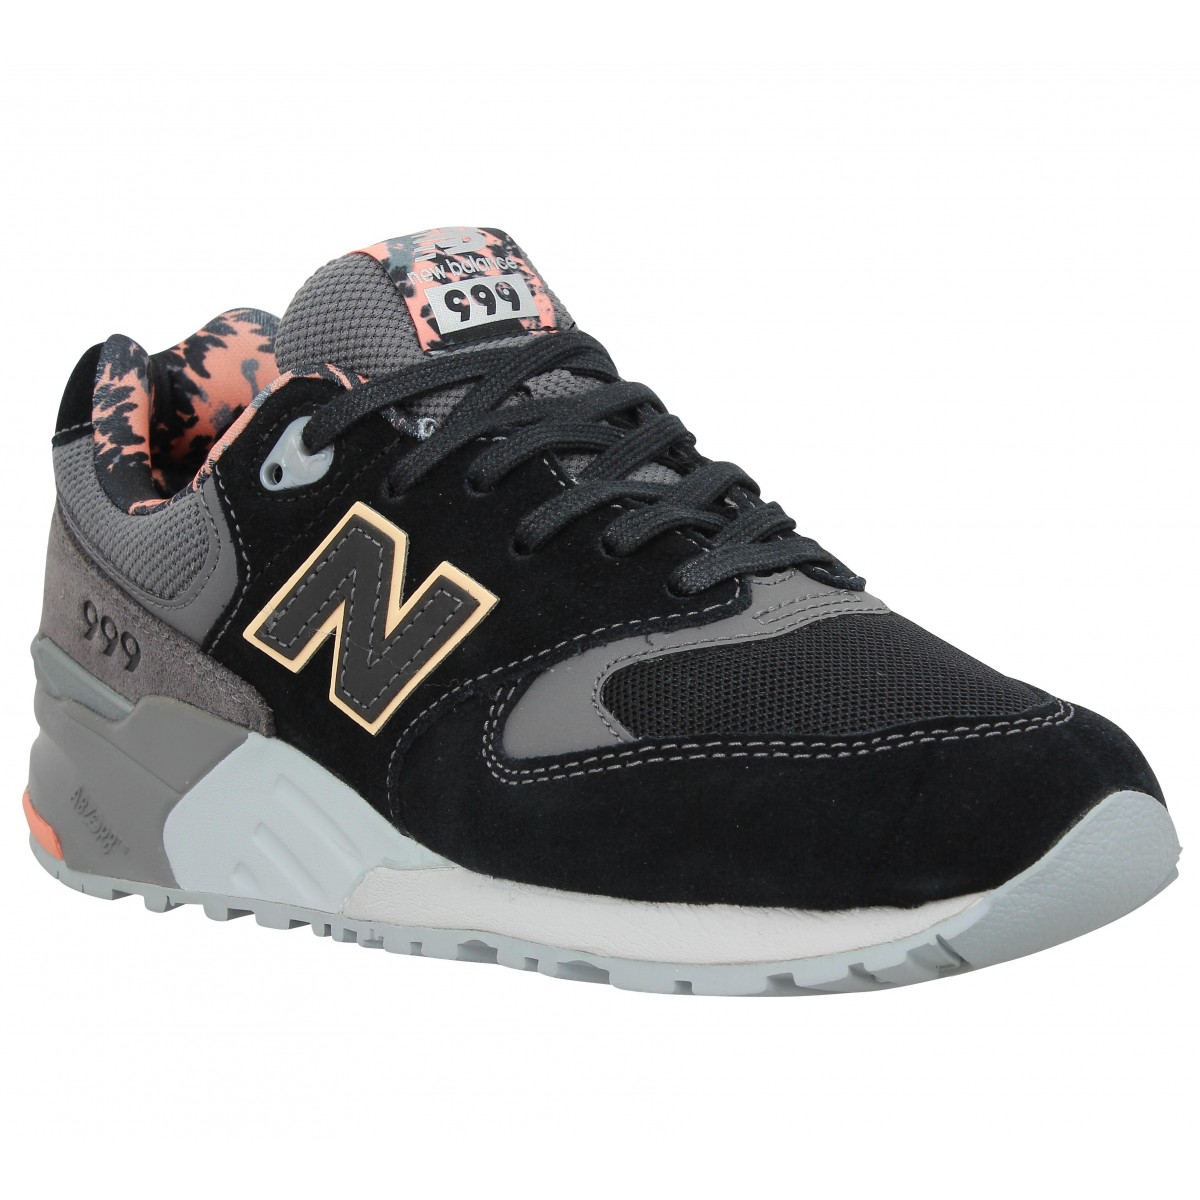 New Balance Marque 999-40-black